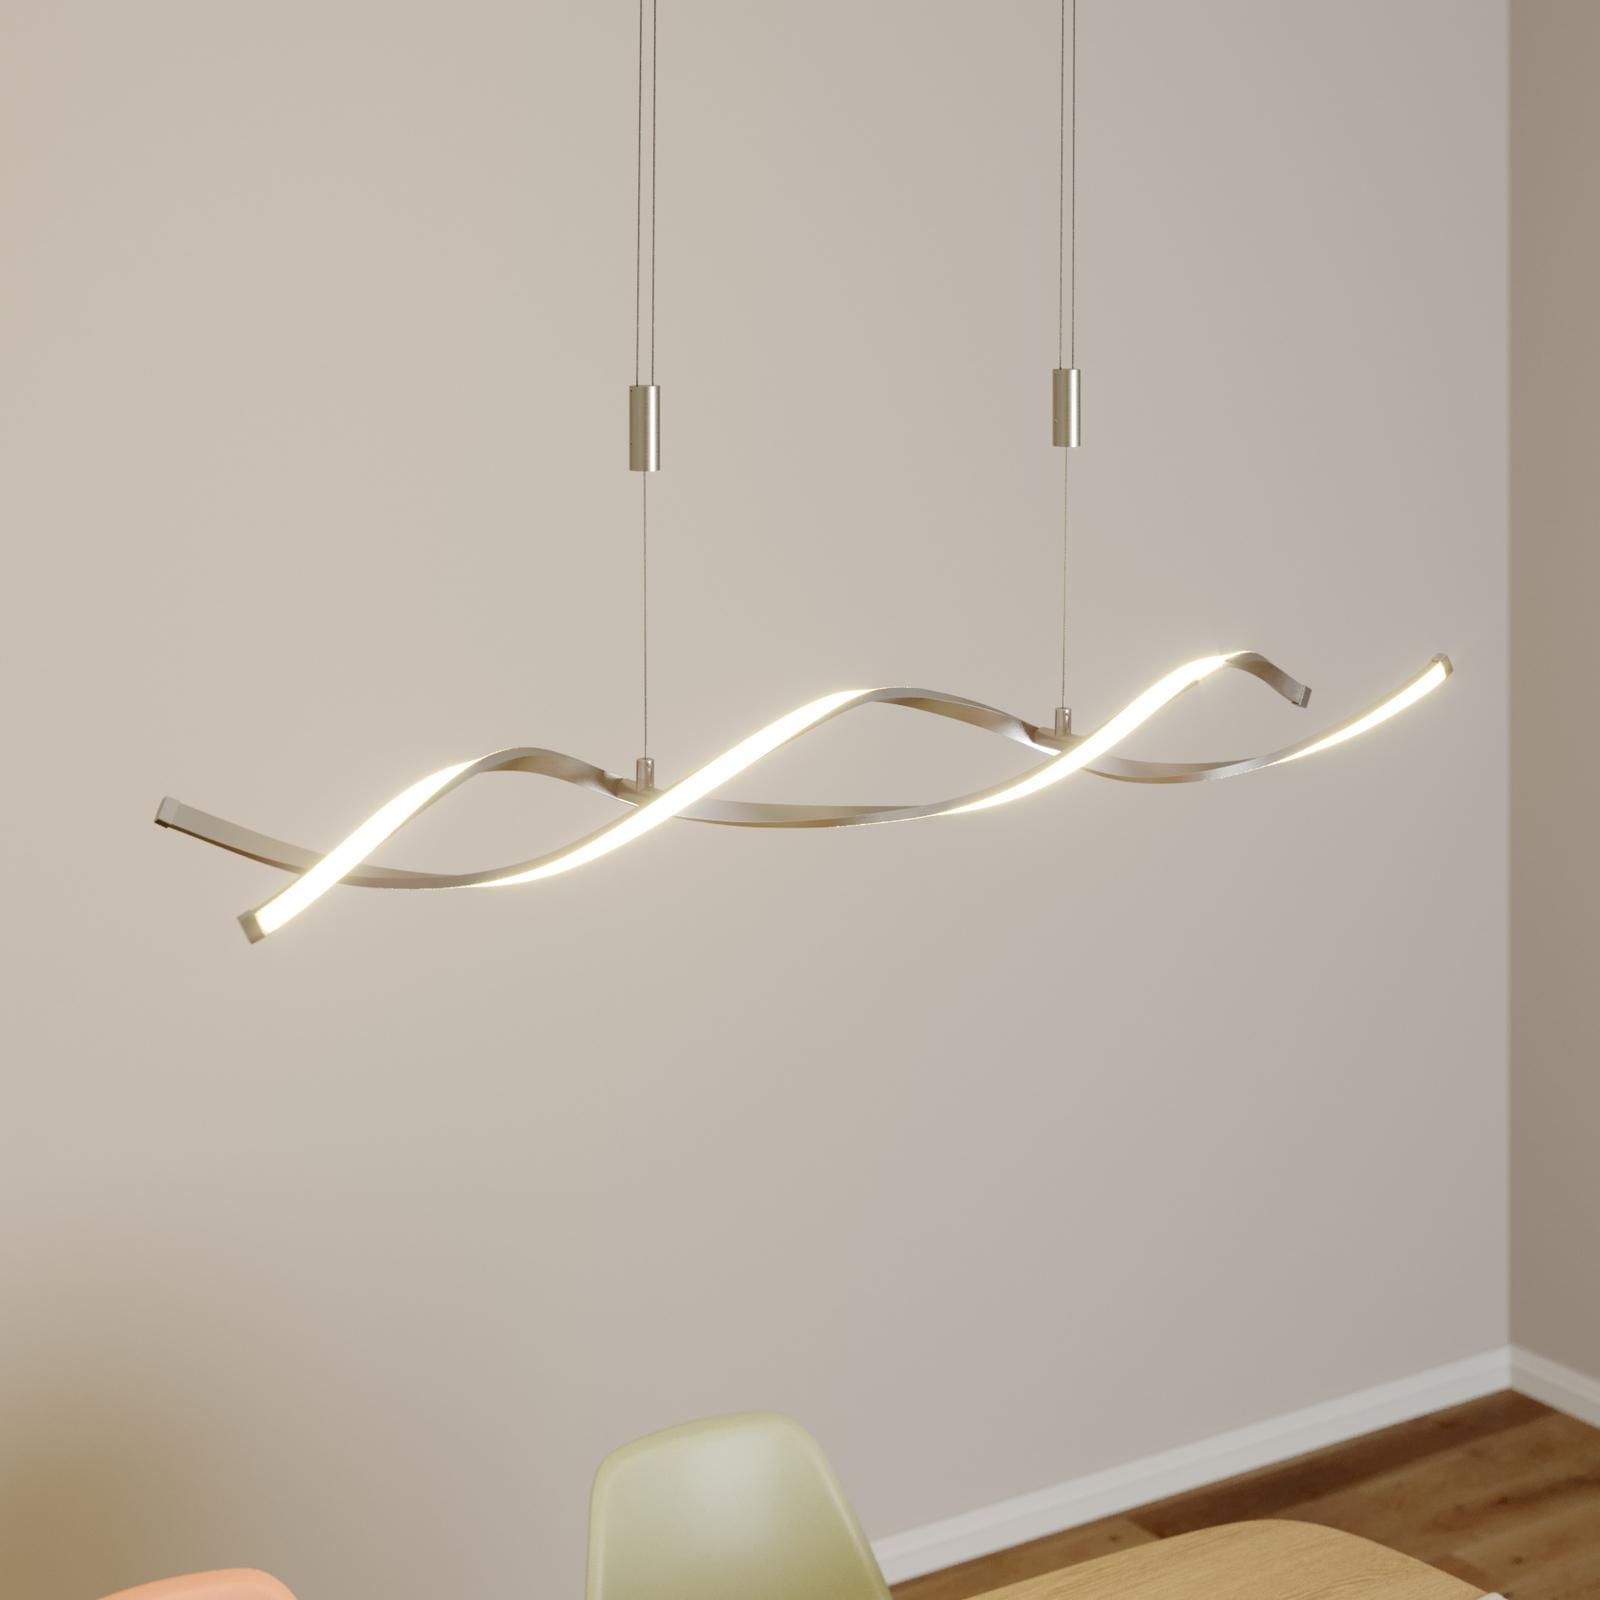 Højdejusterbar LED-pendellampe Auron